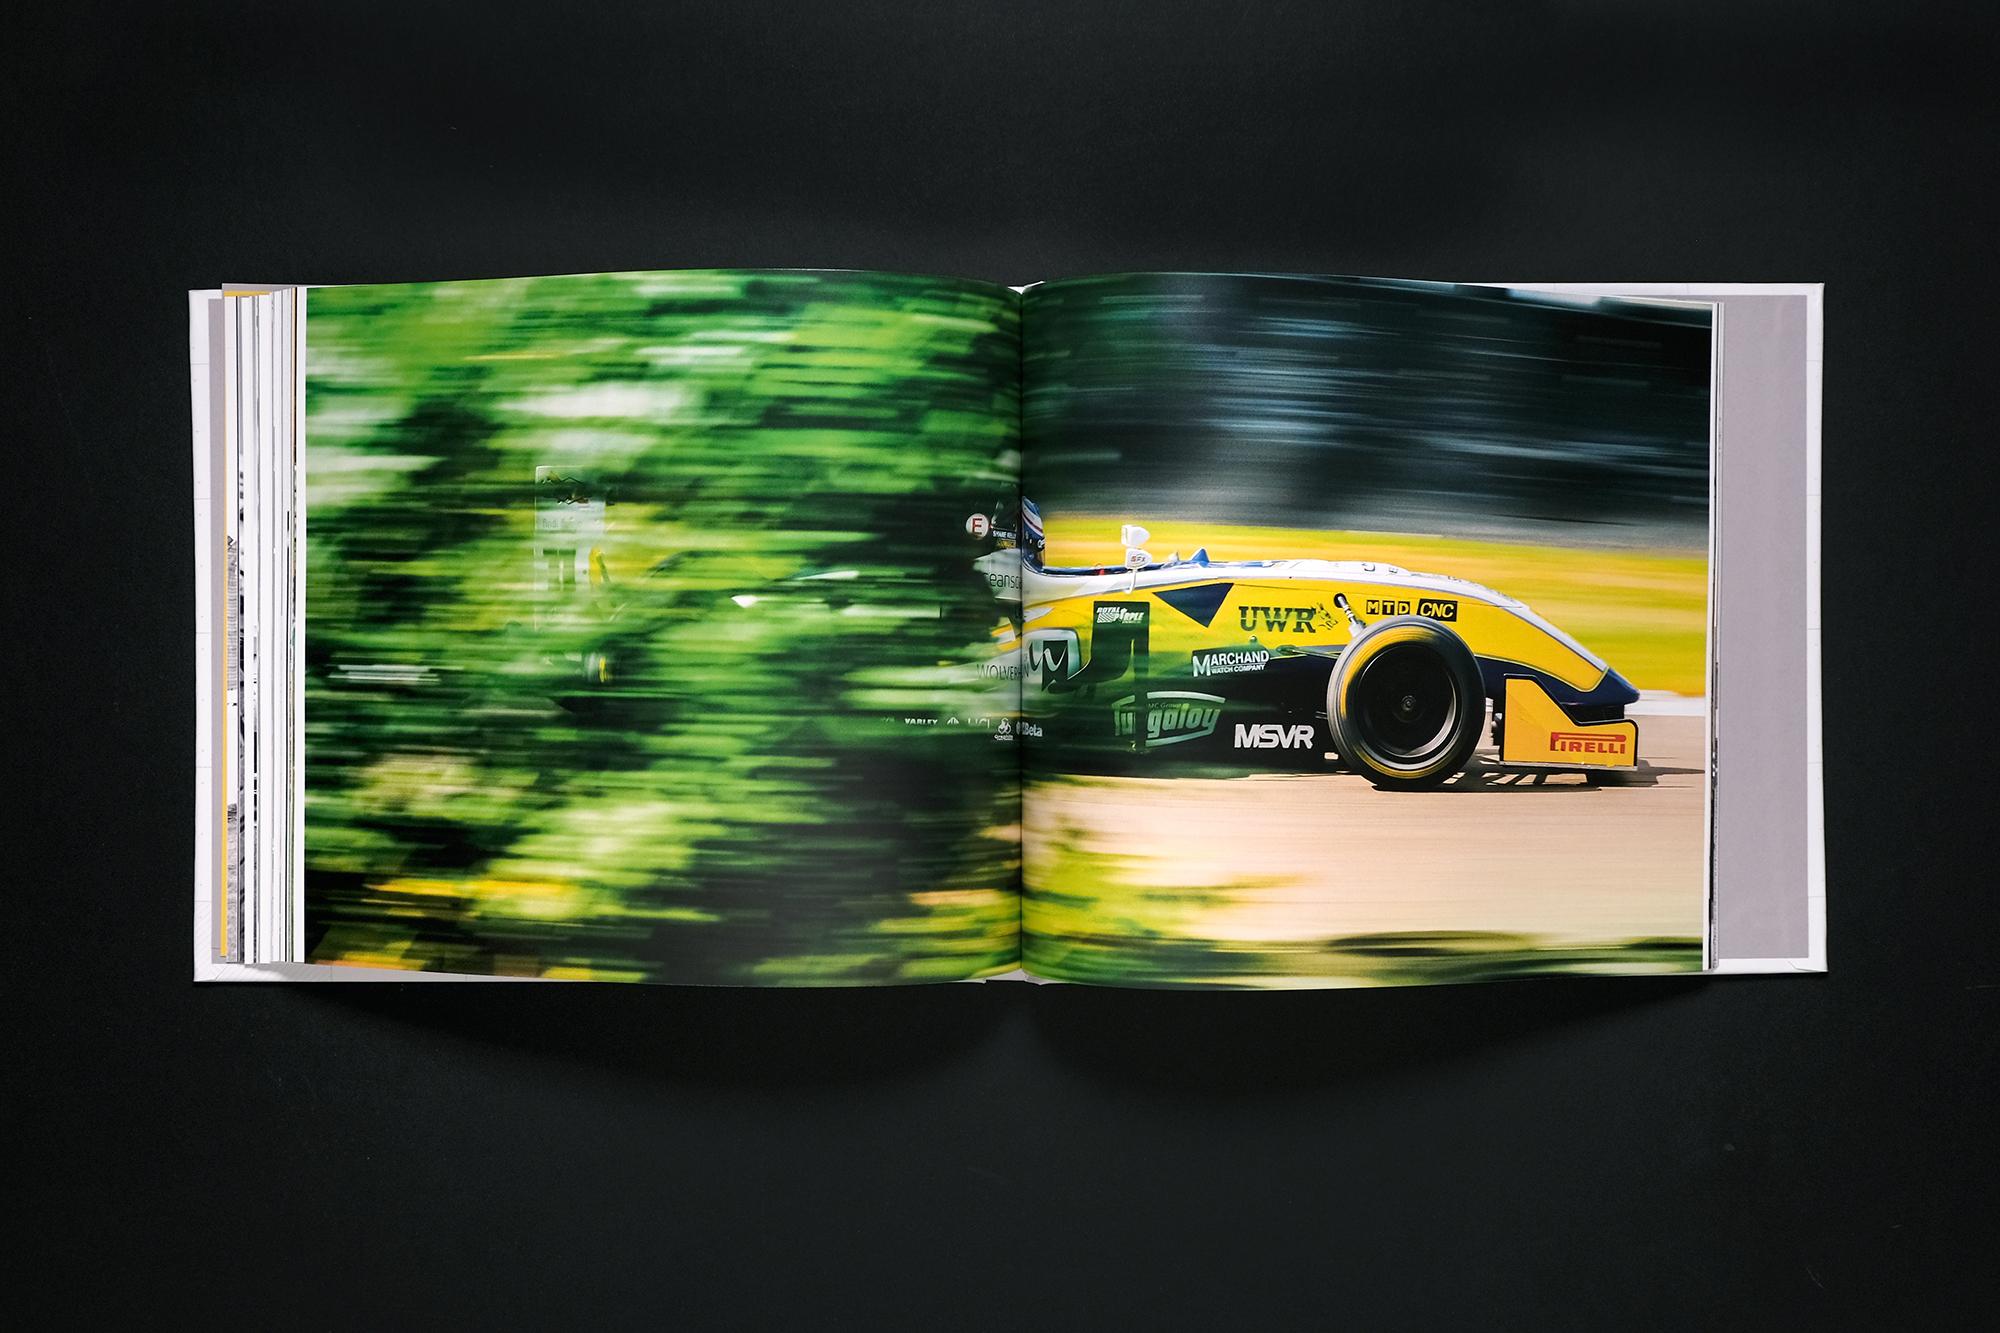 https://rusyndesign.co.uk/wp-content/uploads/2020/04/UWR-19-book-shots-21.jpg